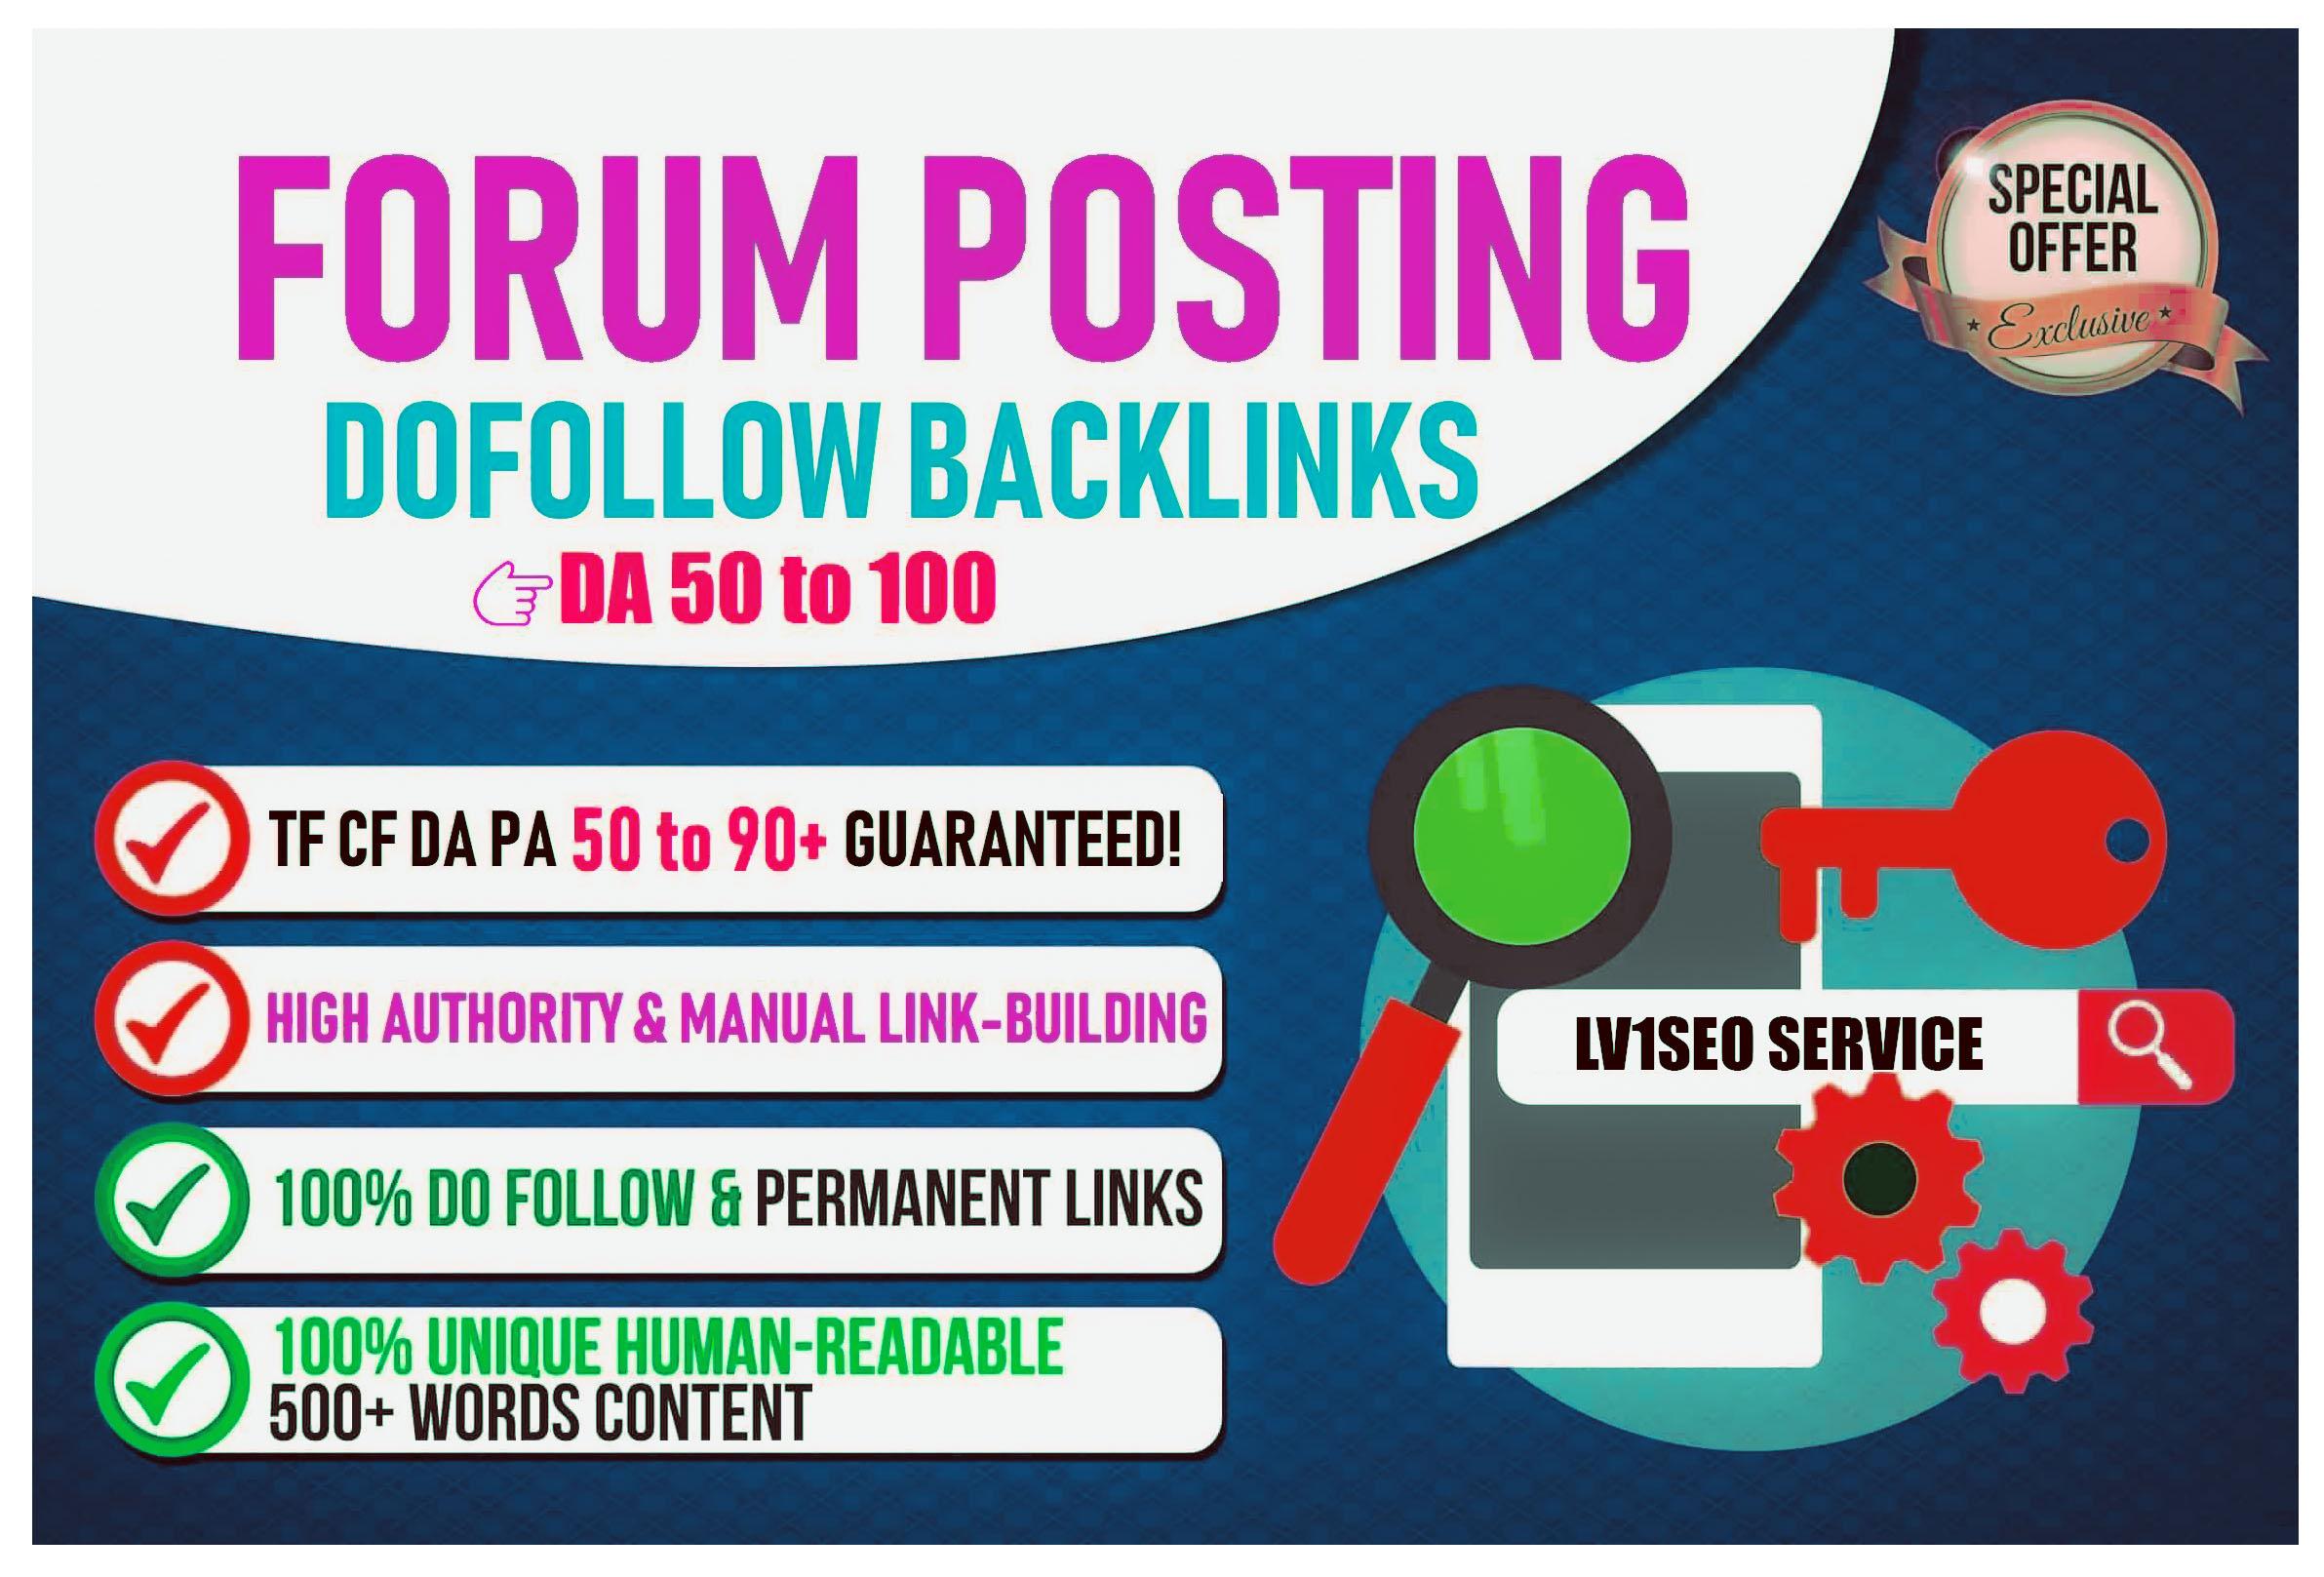 400 Forum Posting Dofollow Backlinks